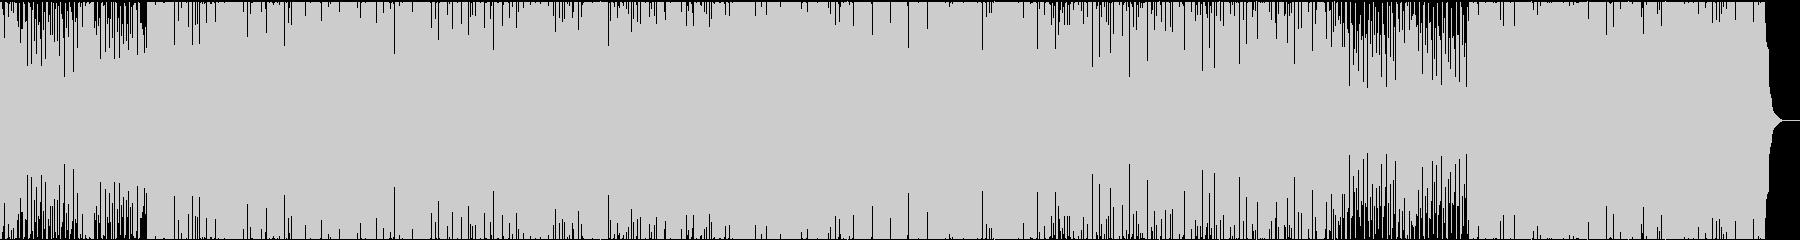 News4 ニュース・情報・企業VPの未再生の波形